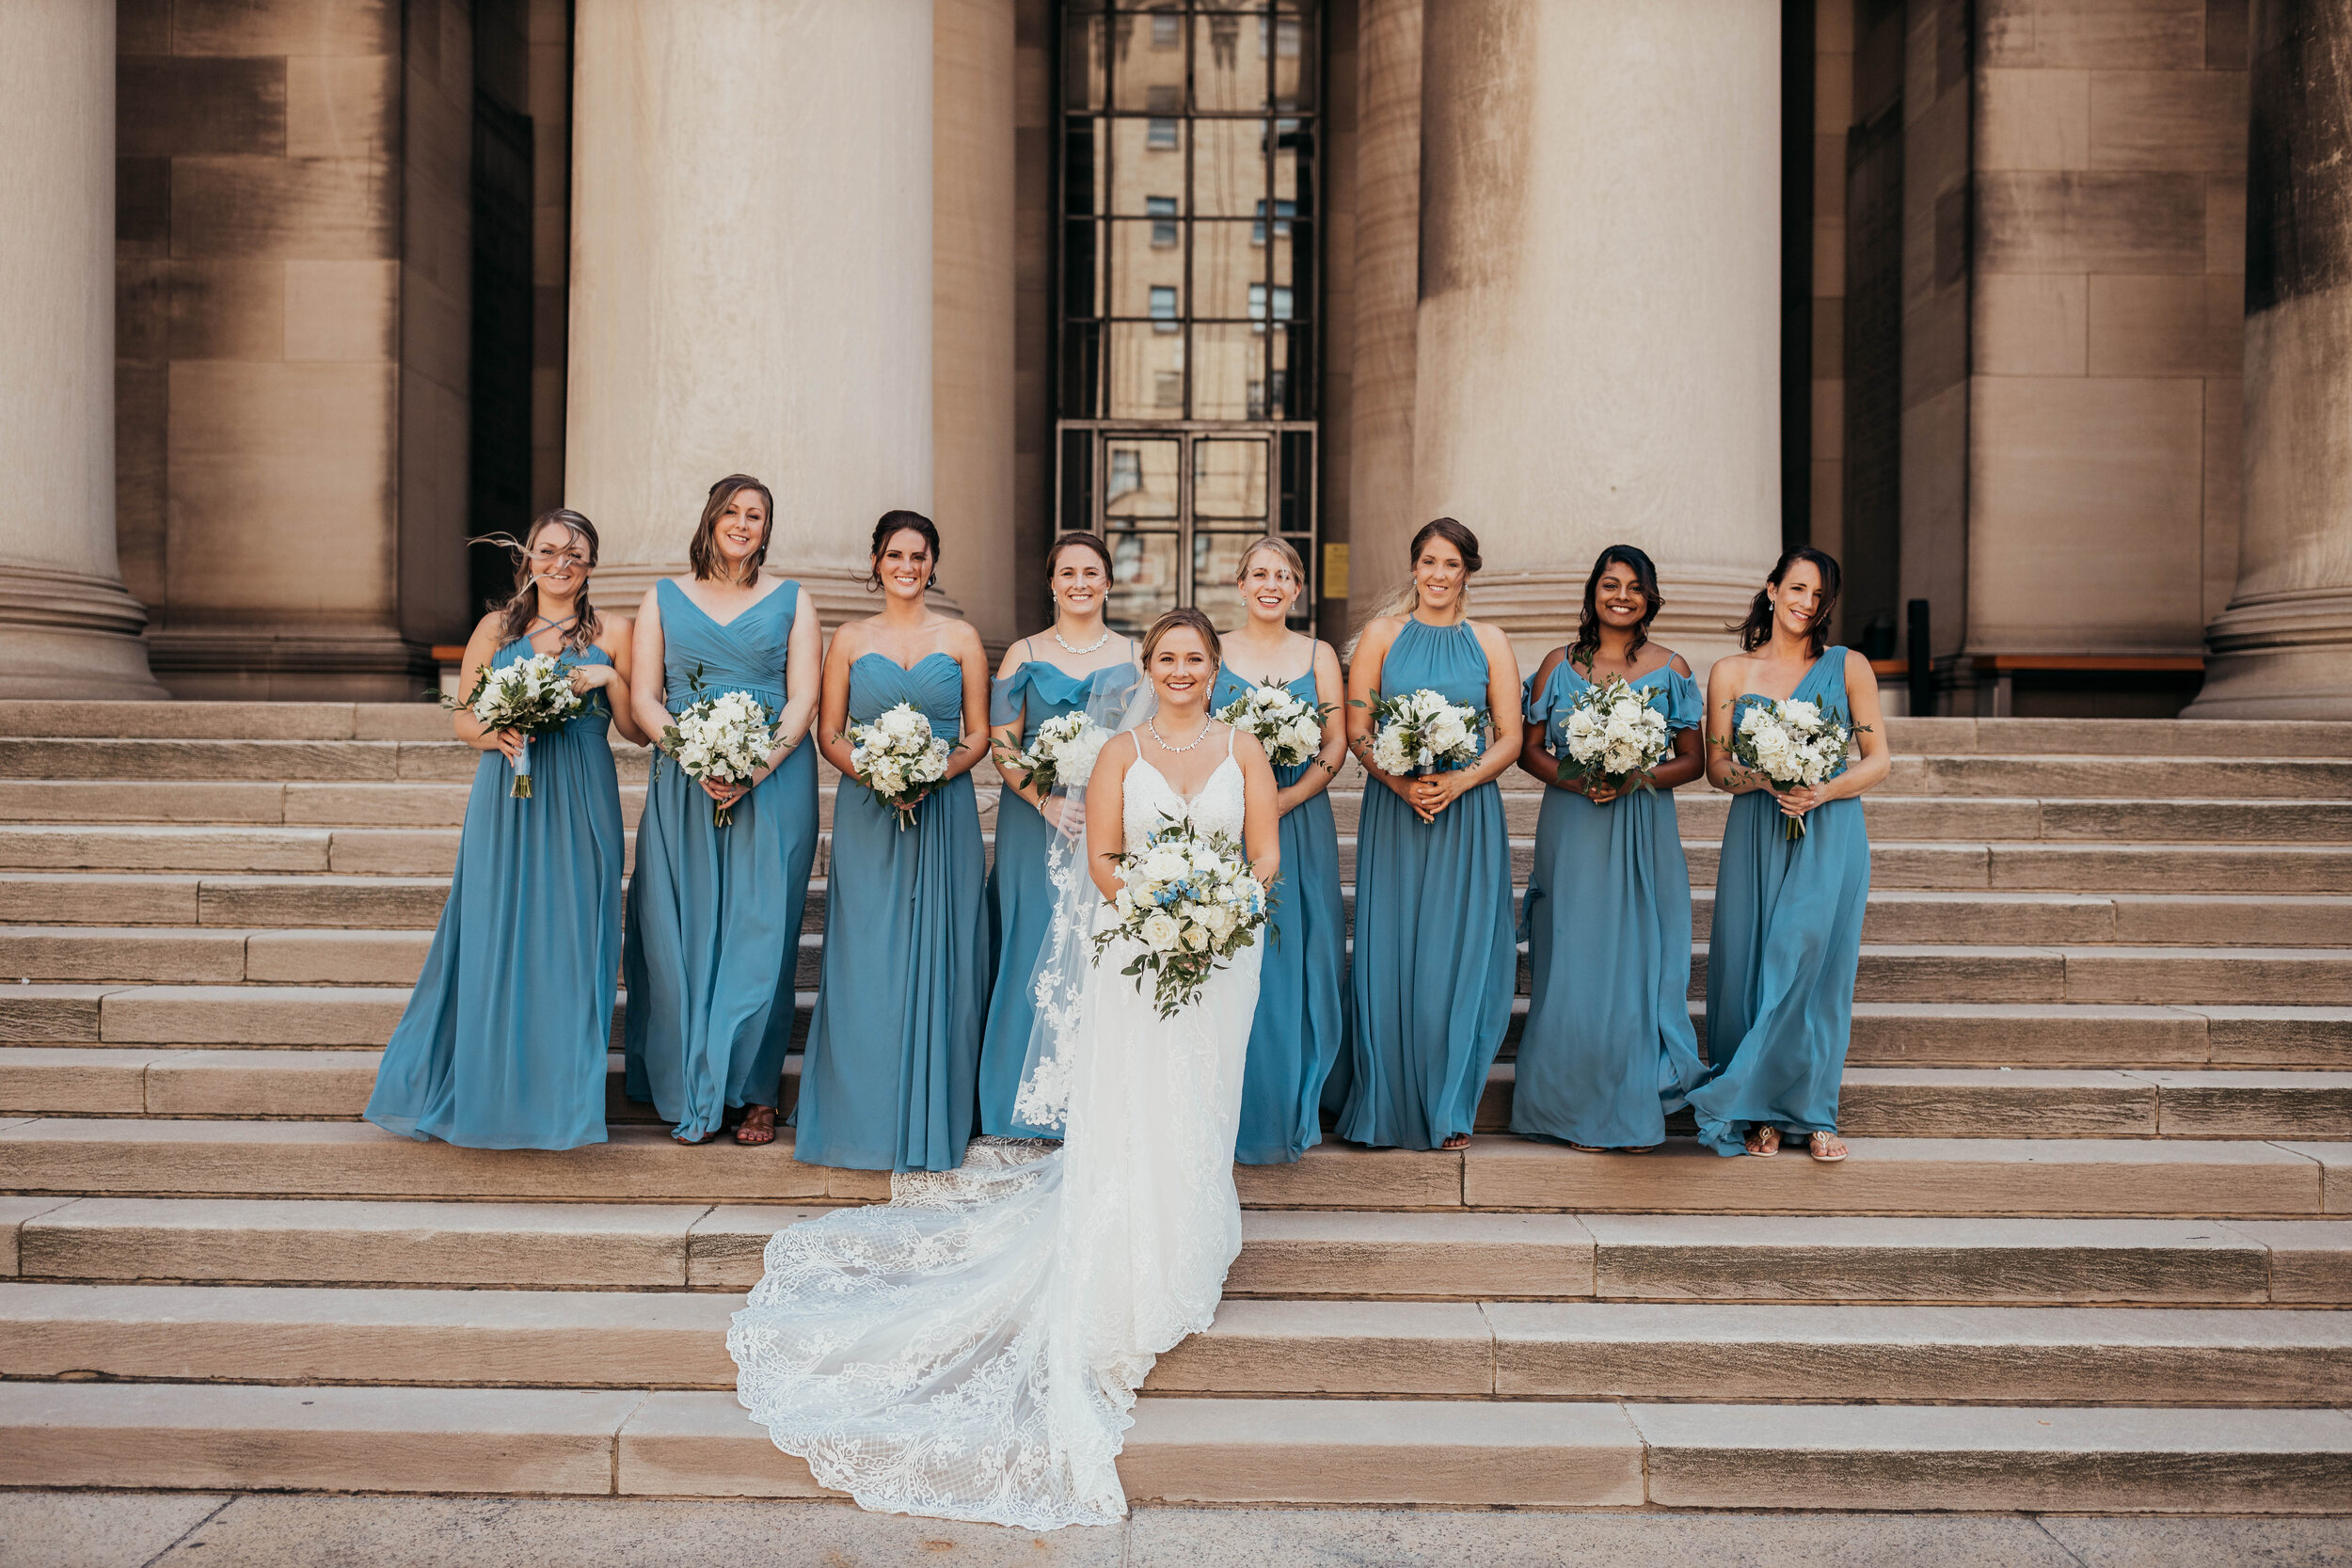 Pittsburgh wedding photography - Hartwood Acres Mansion wedding-370.jpg